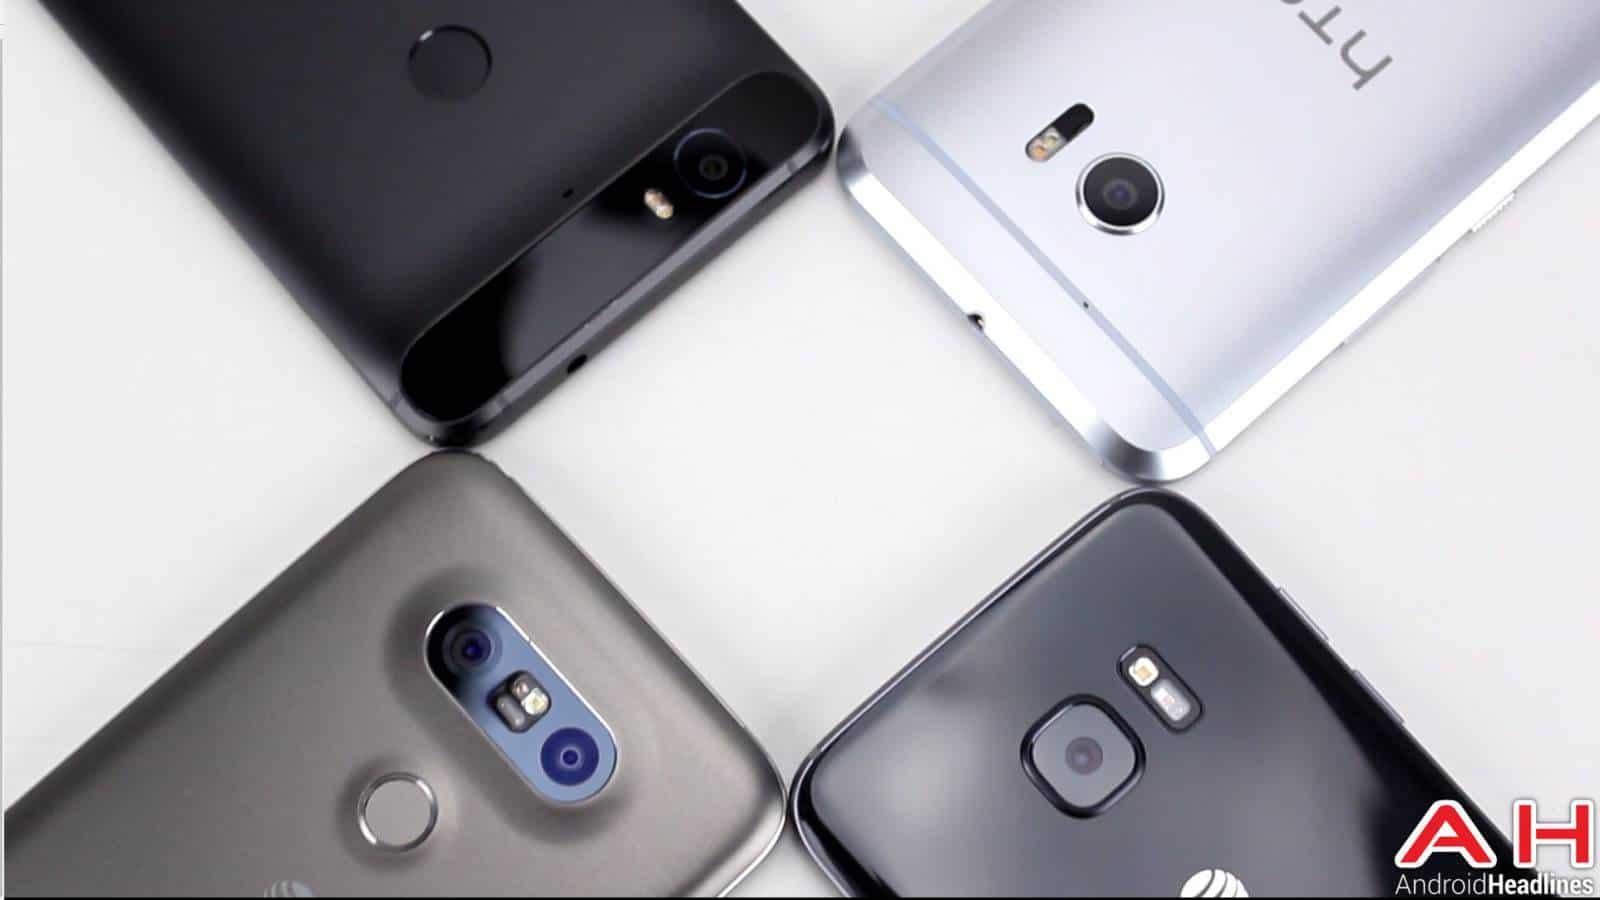 galaxy-s7-edge-lg-g5-htc-10-nexus-6p-cameras